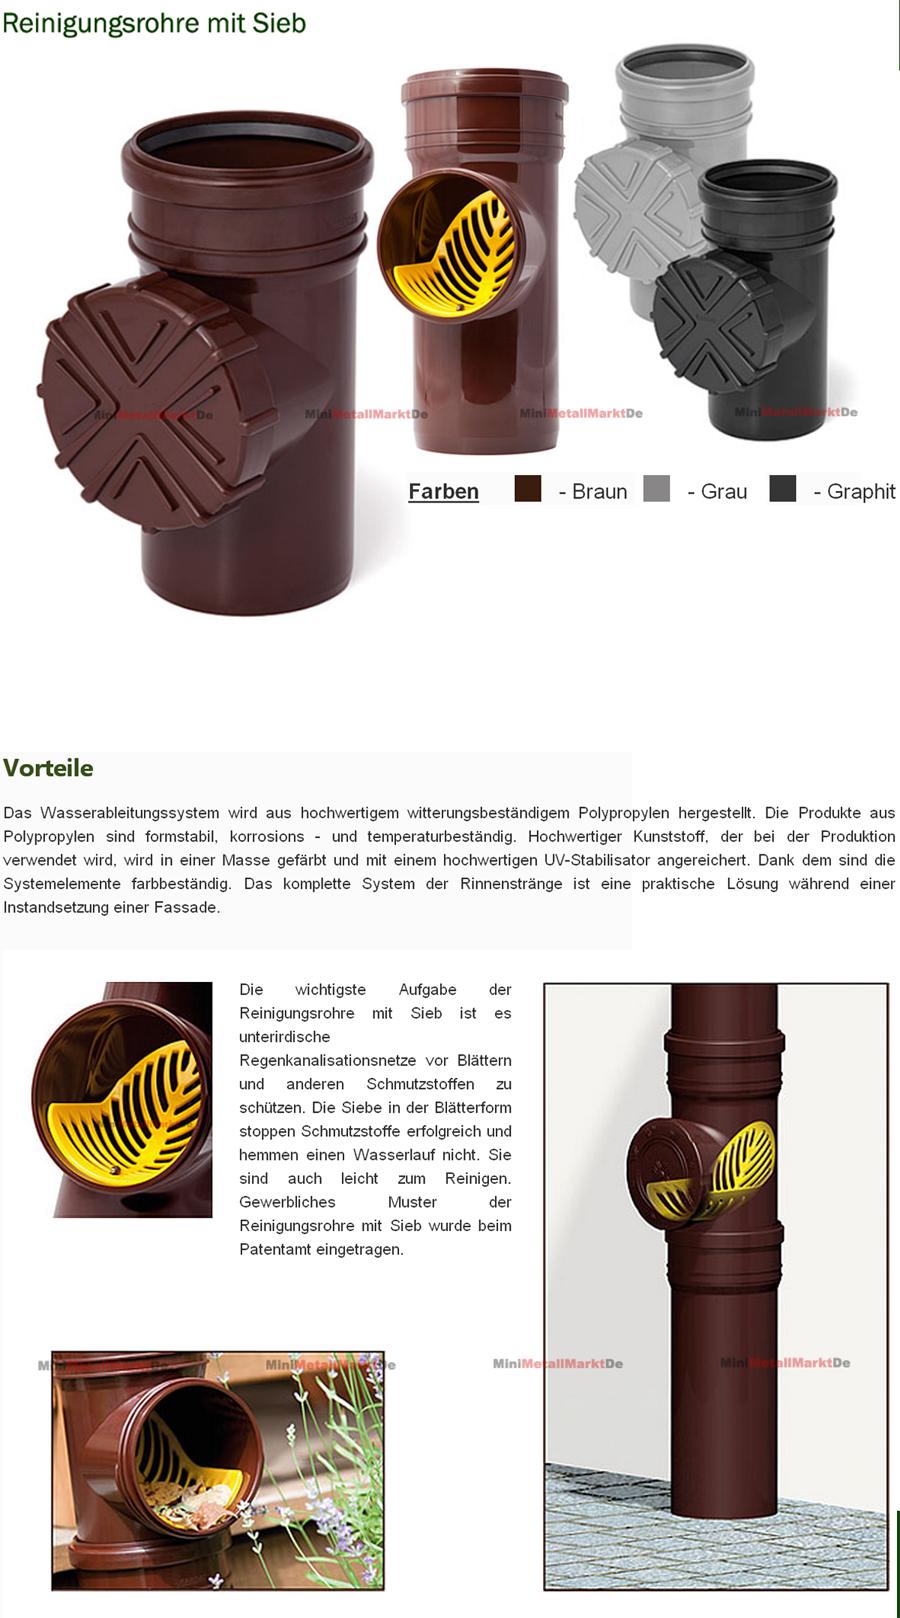 fallrohrfilter regenrohrfilter dachrinne laubschutz laubfang 110 ht kg rohr ebay. Black Bedroom Furniture Sets. Home Design Ideas